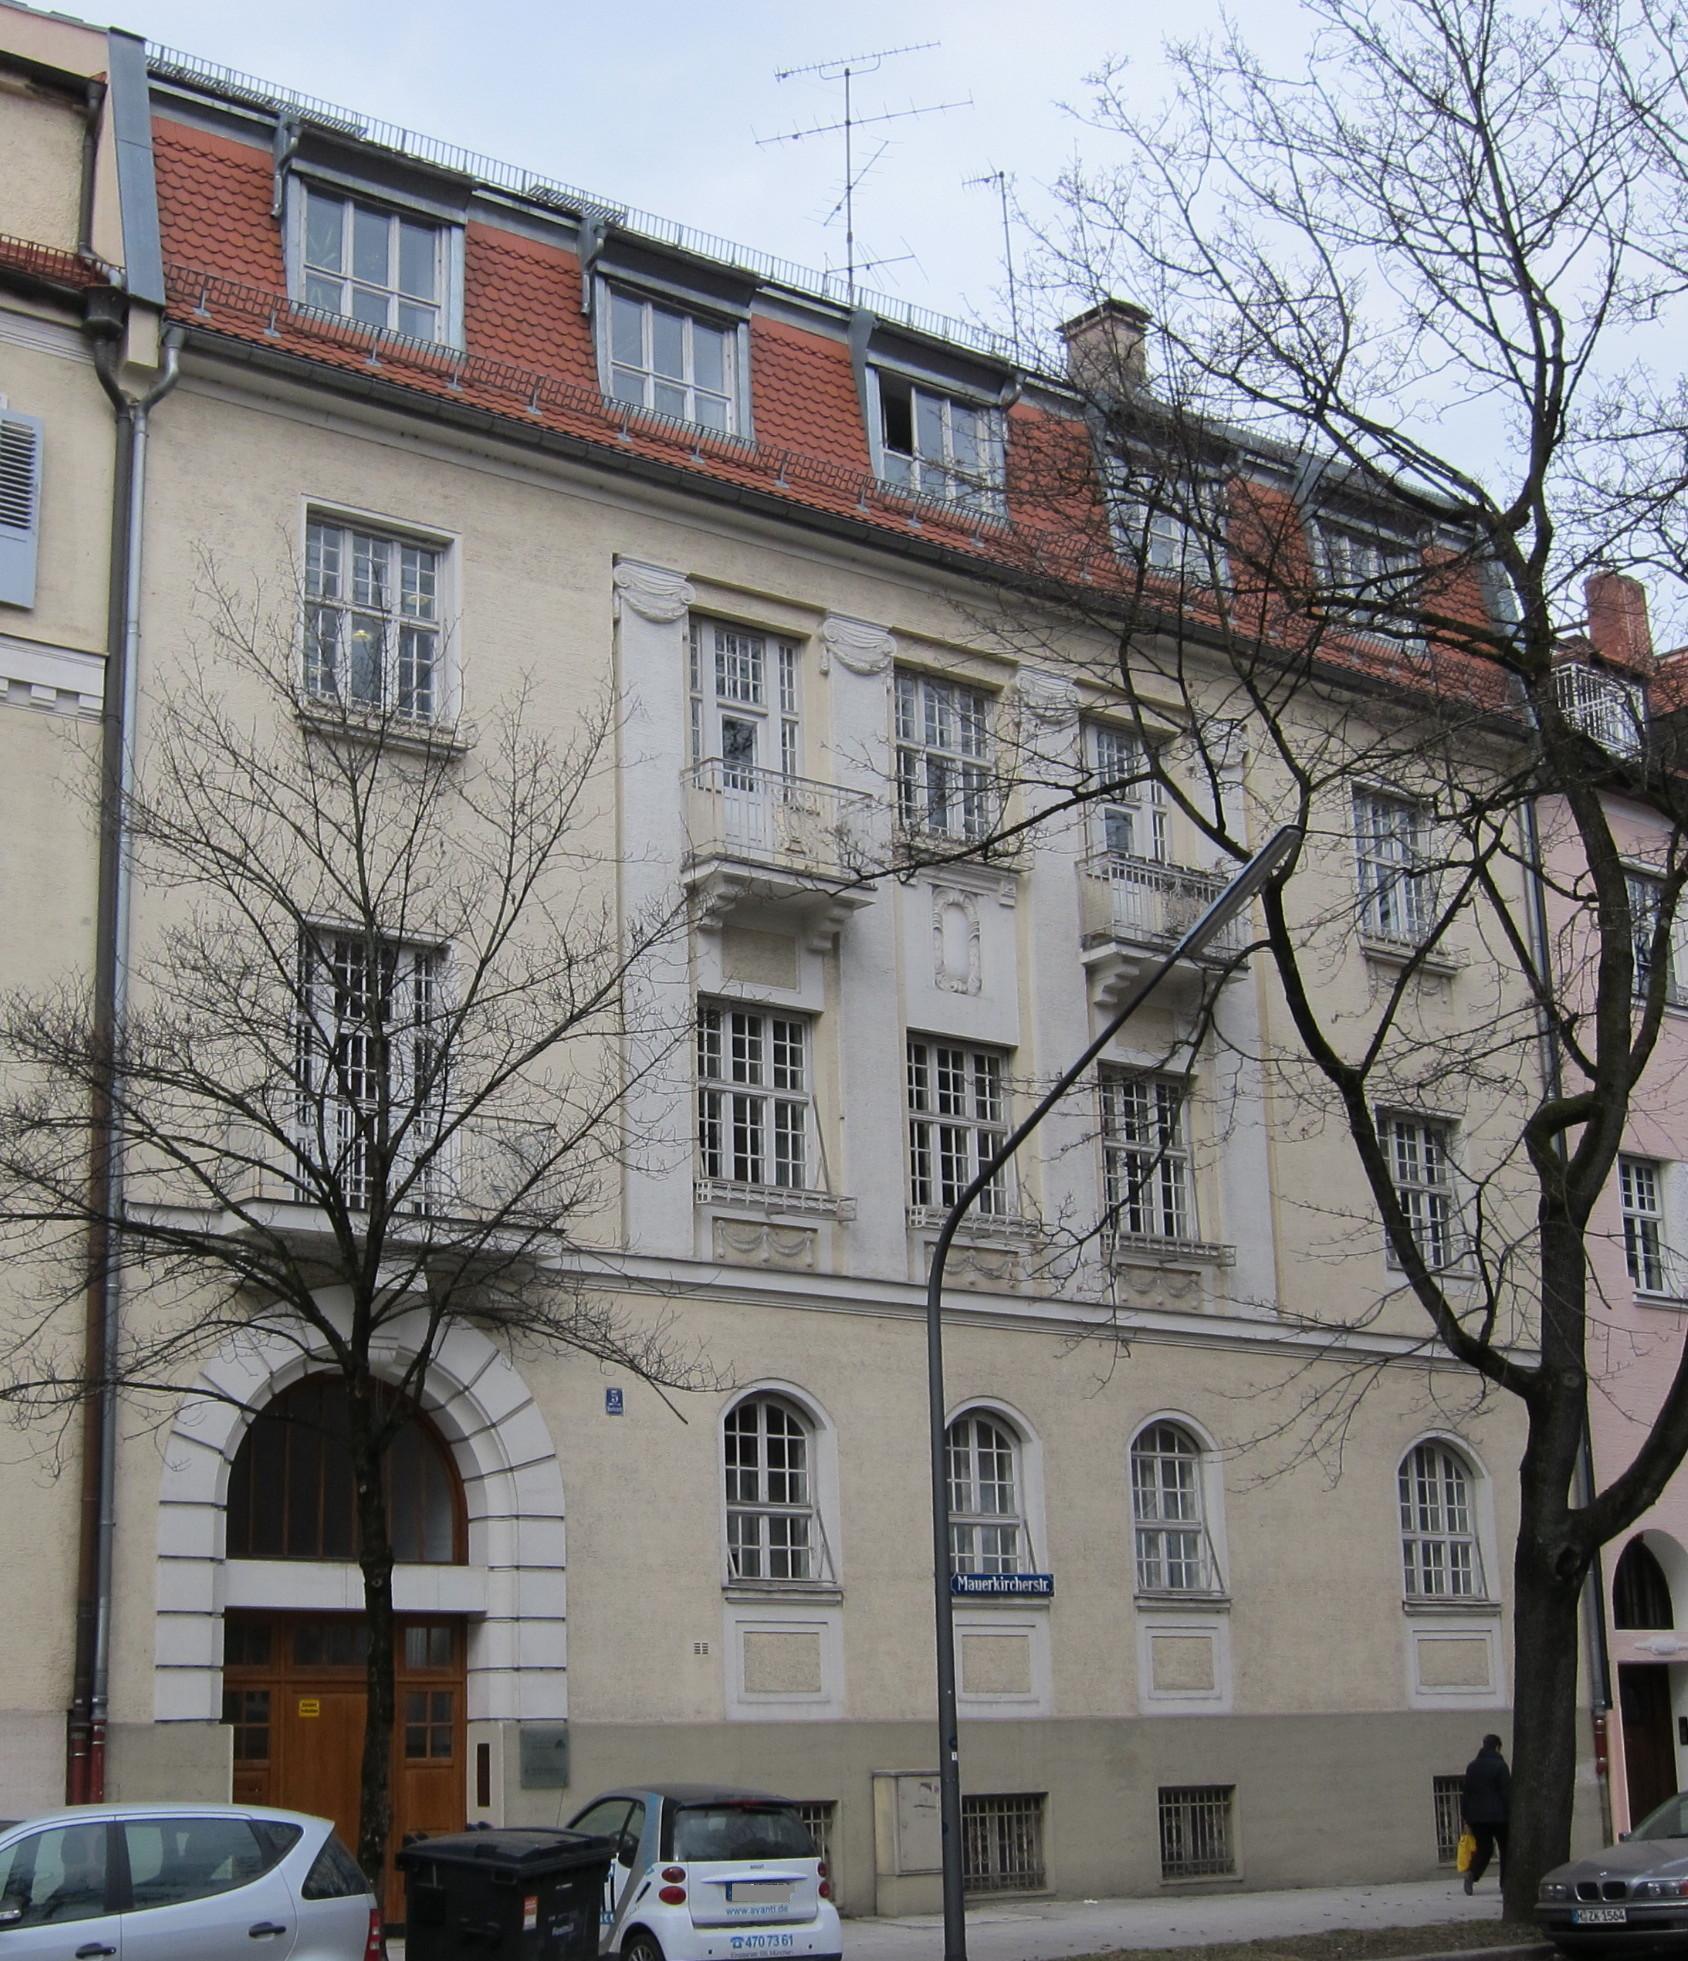 Mauerkircherstr München file mauerkircherstr 5 muenchen 01 jpg wikimedia commons